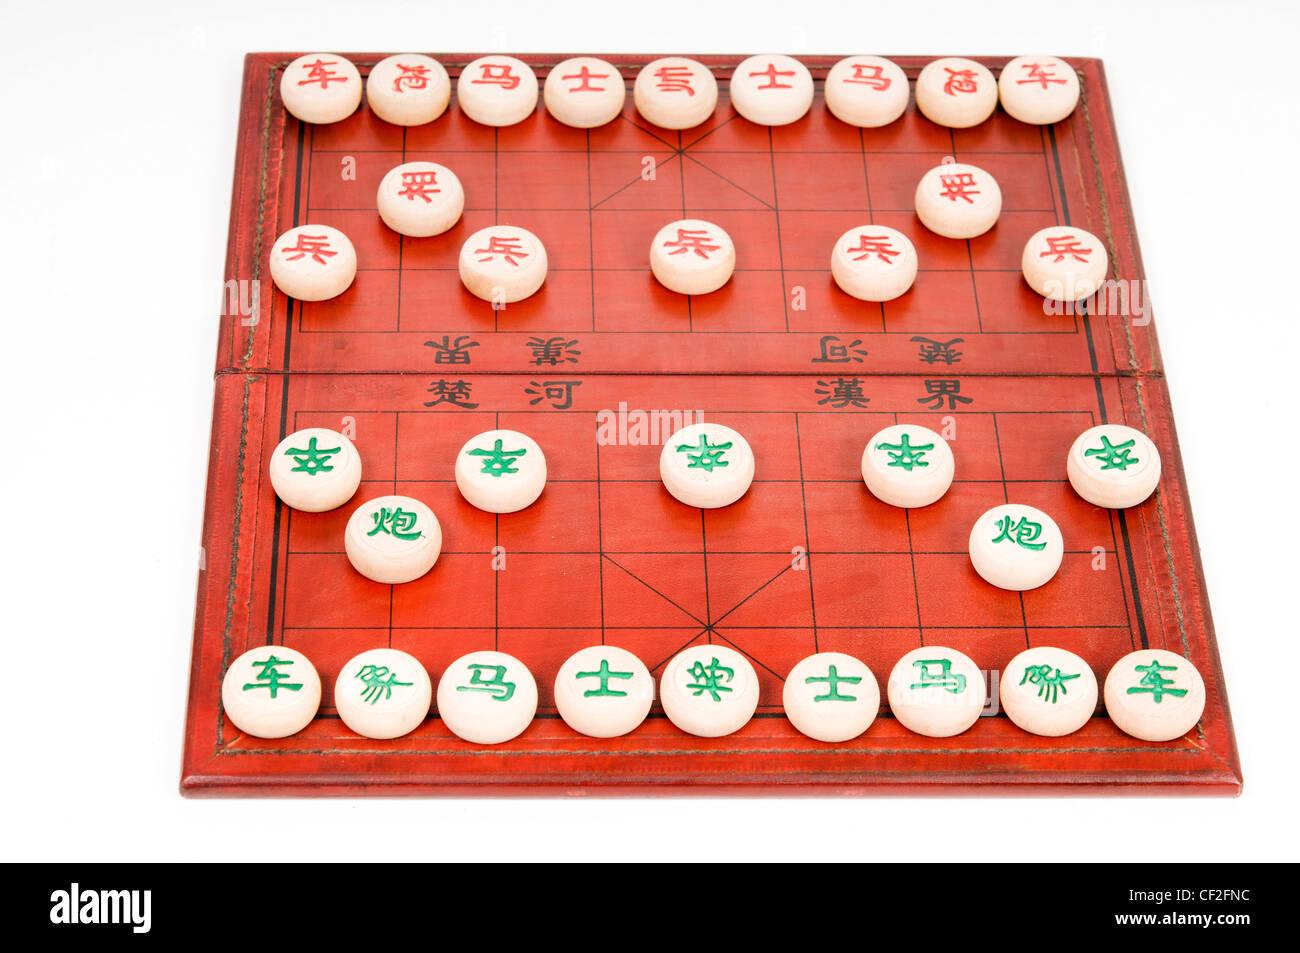 Chinese chess, Xiangqi, starting position - Stock Image